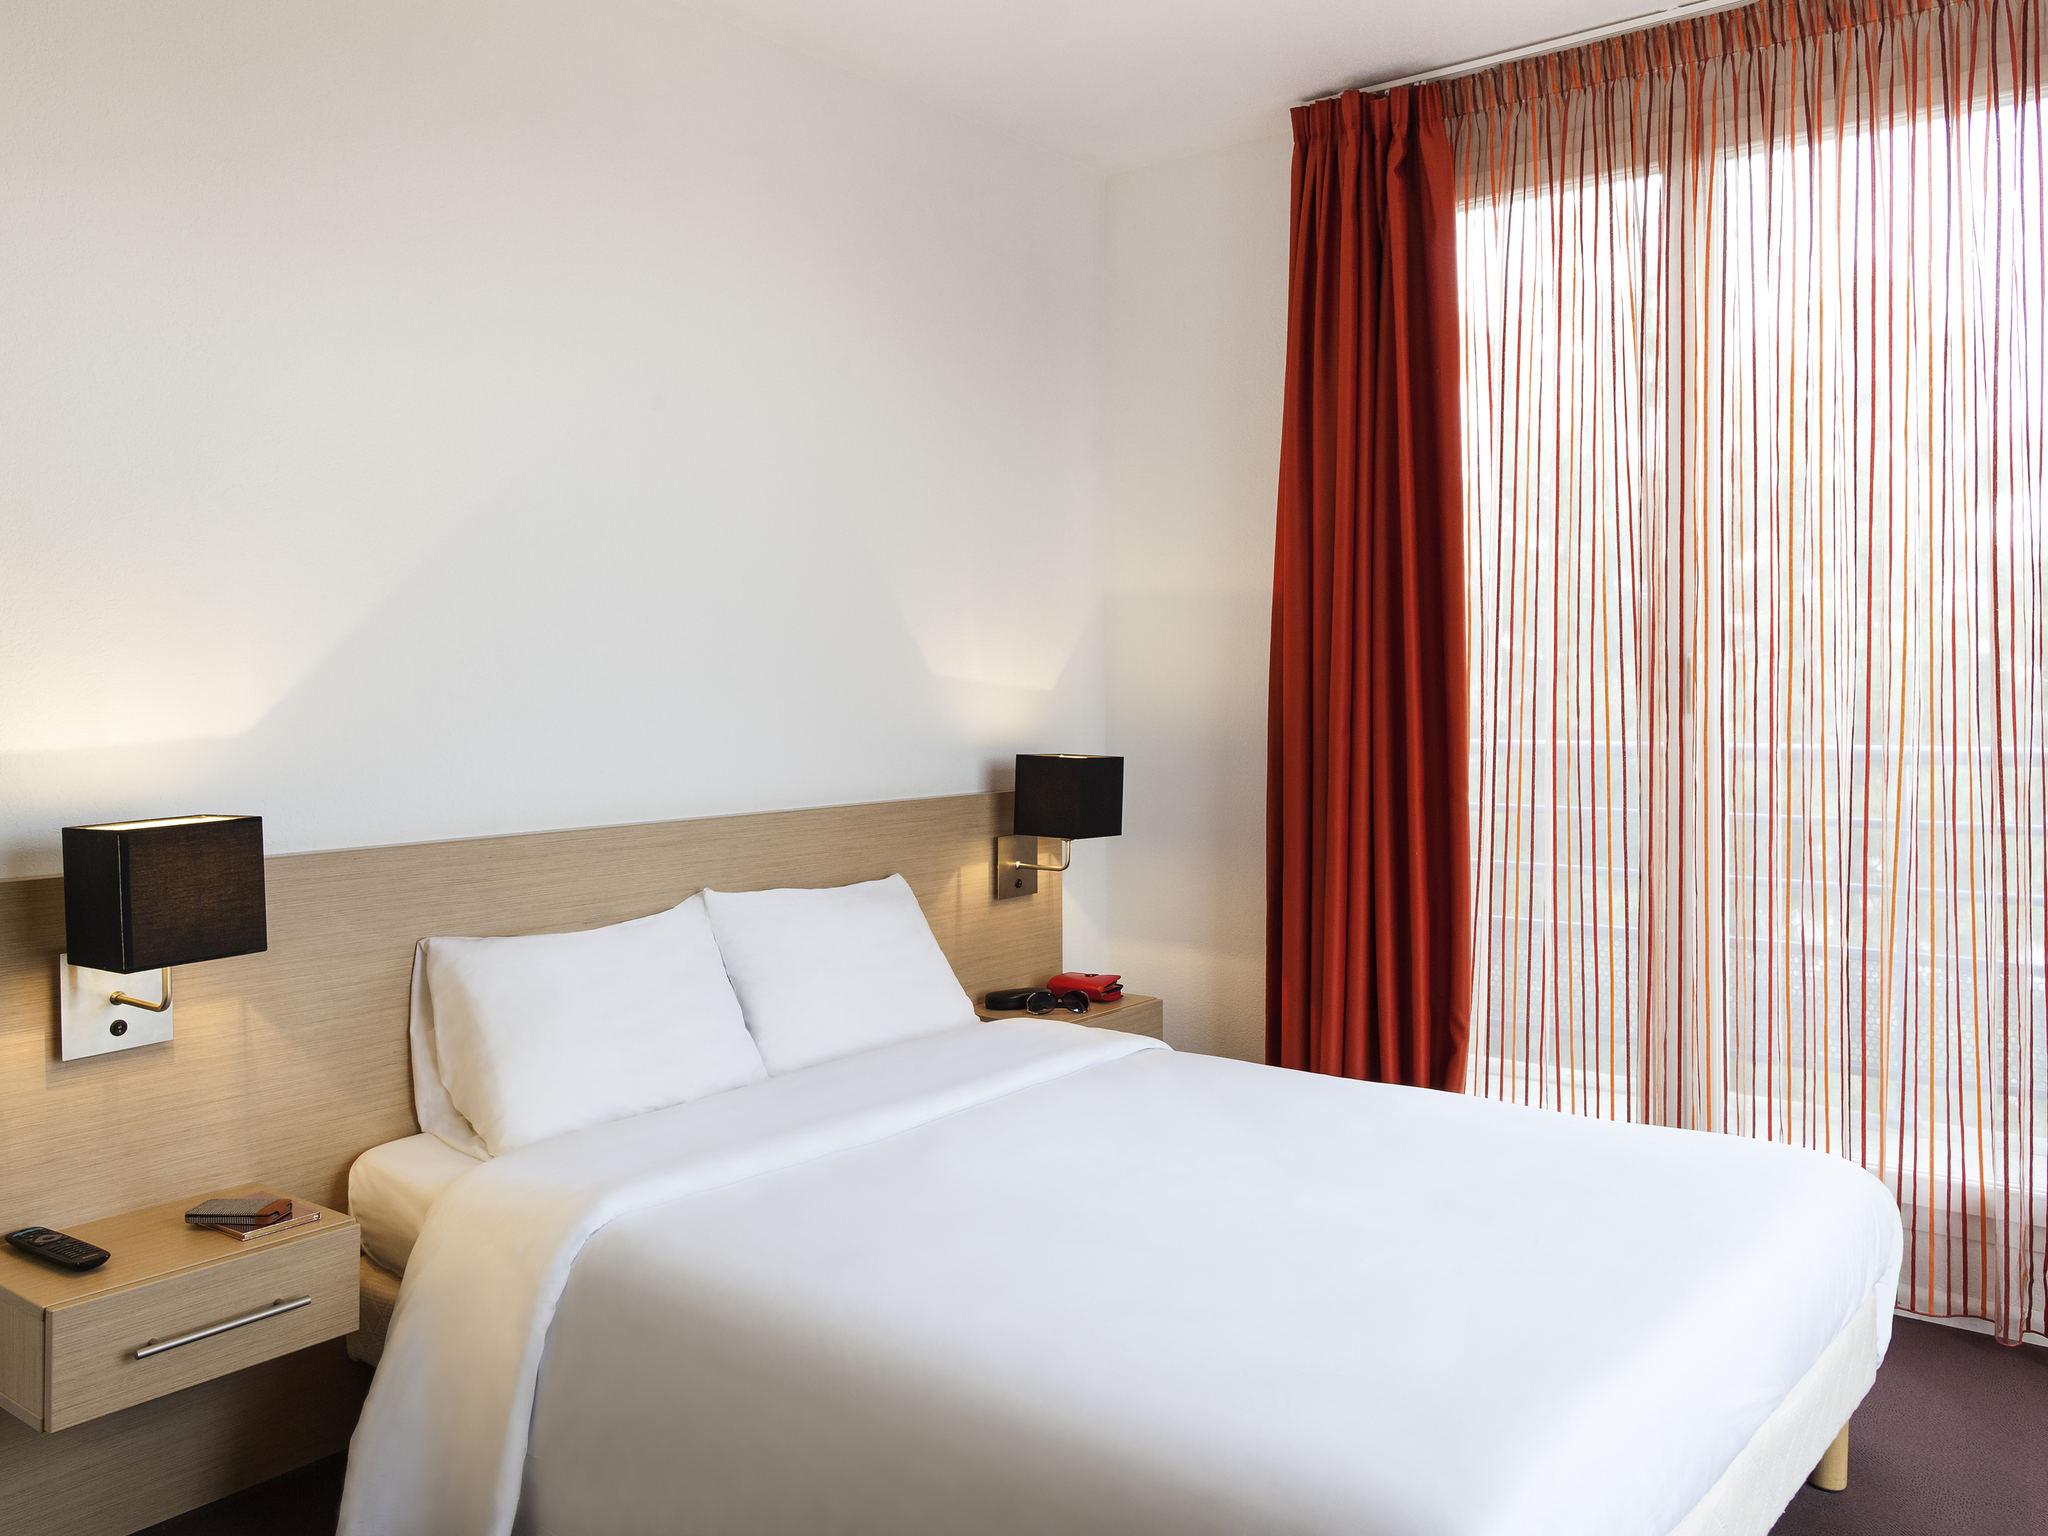 فندق - Aparthotel Adagio access Saint-Louis Bâle